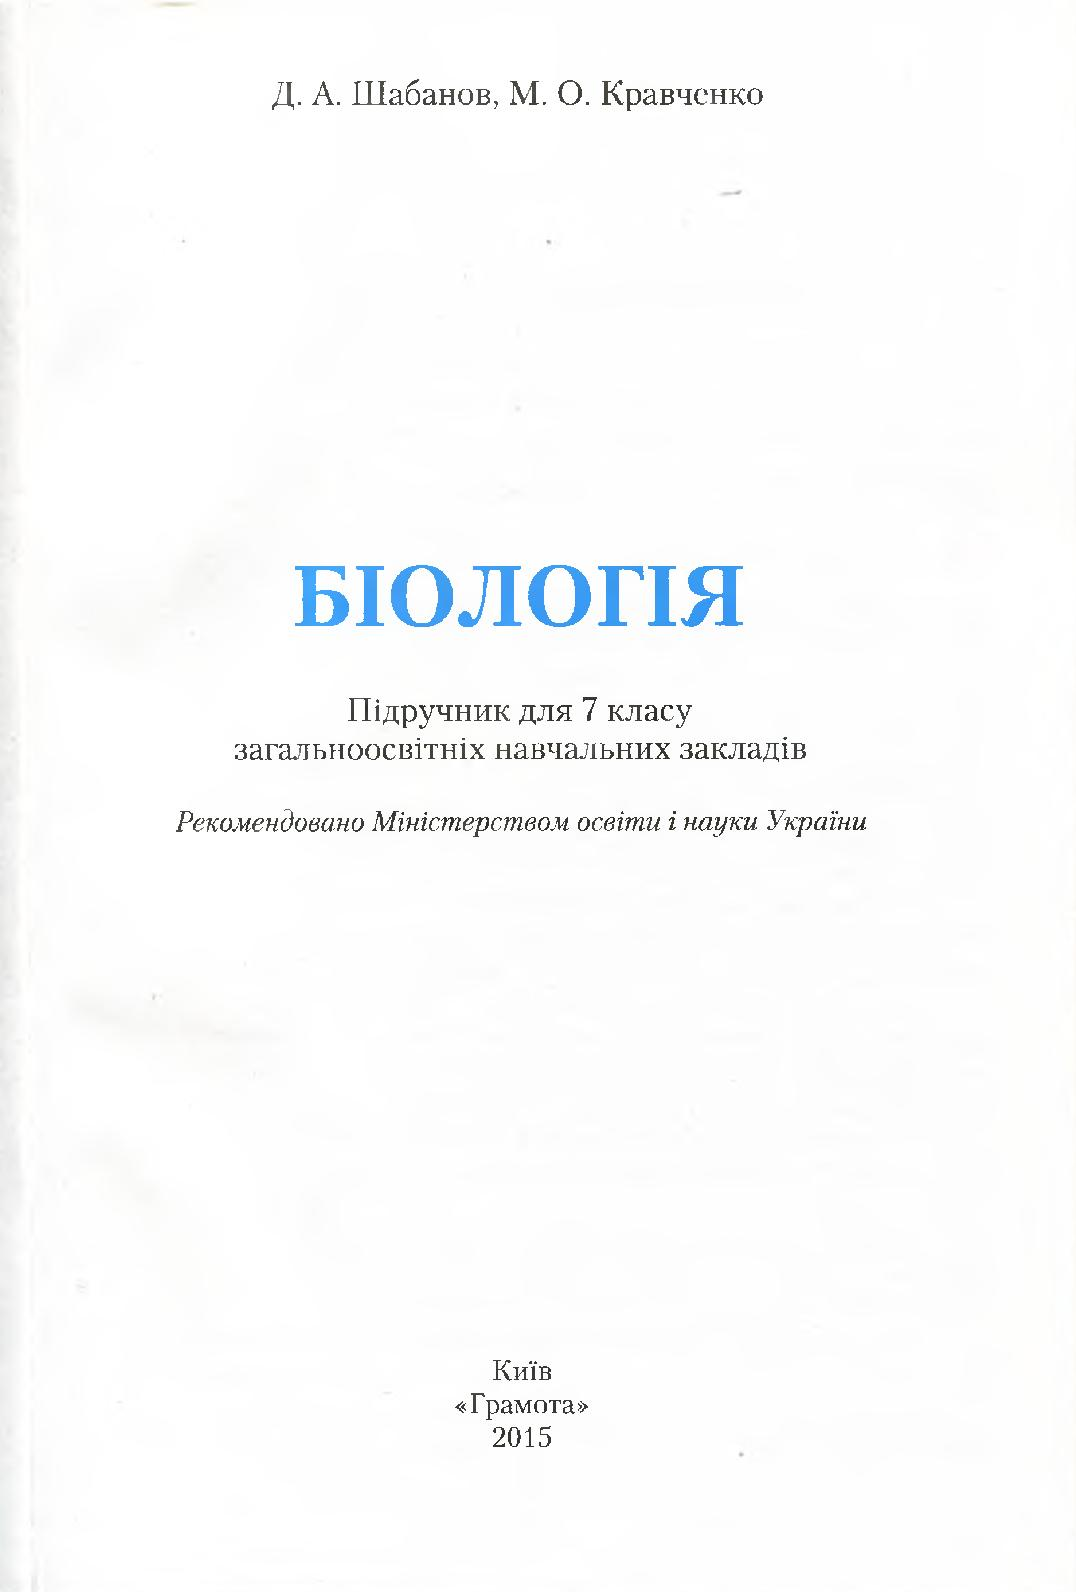 Calaméo - 7 клас. Біологія (Шабан ef54f80e06a68